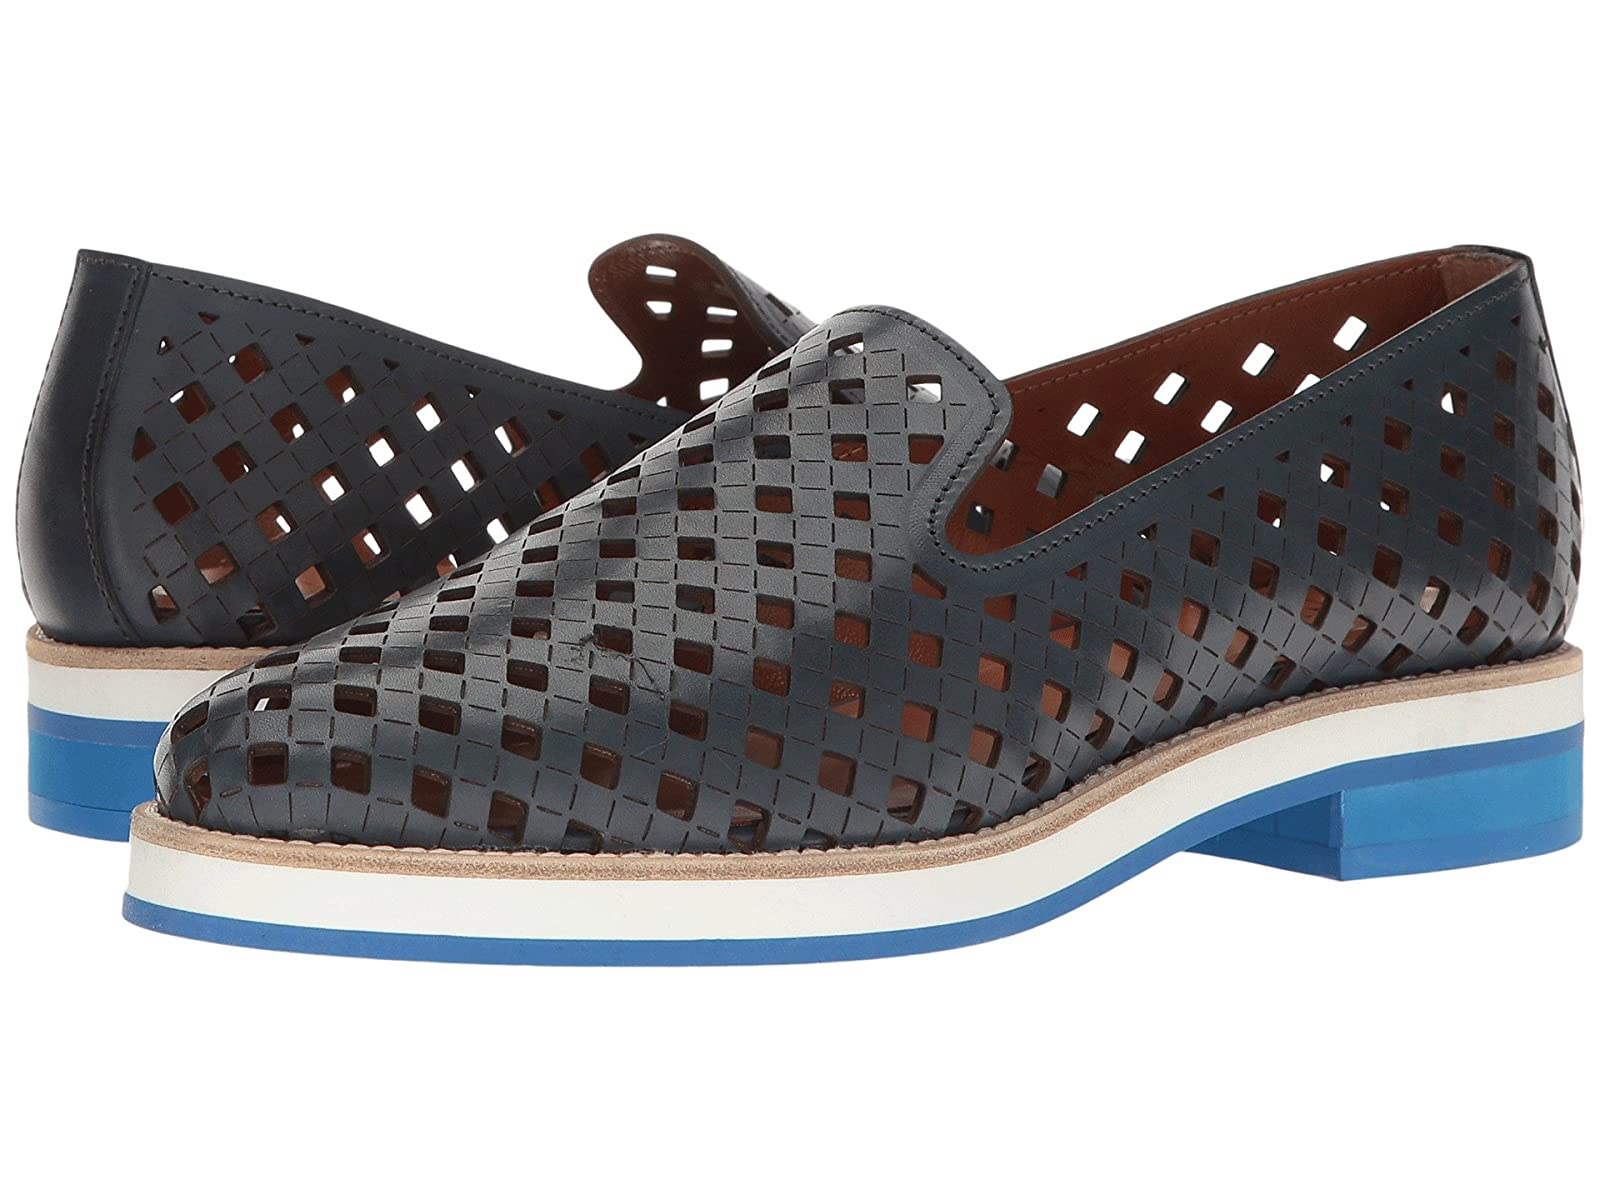 Aquatalia ZannaCheap and distinctive eye-catching shoes